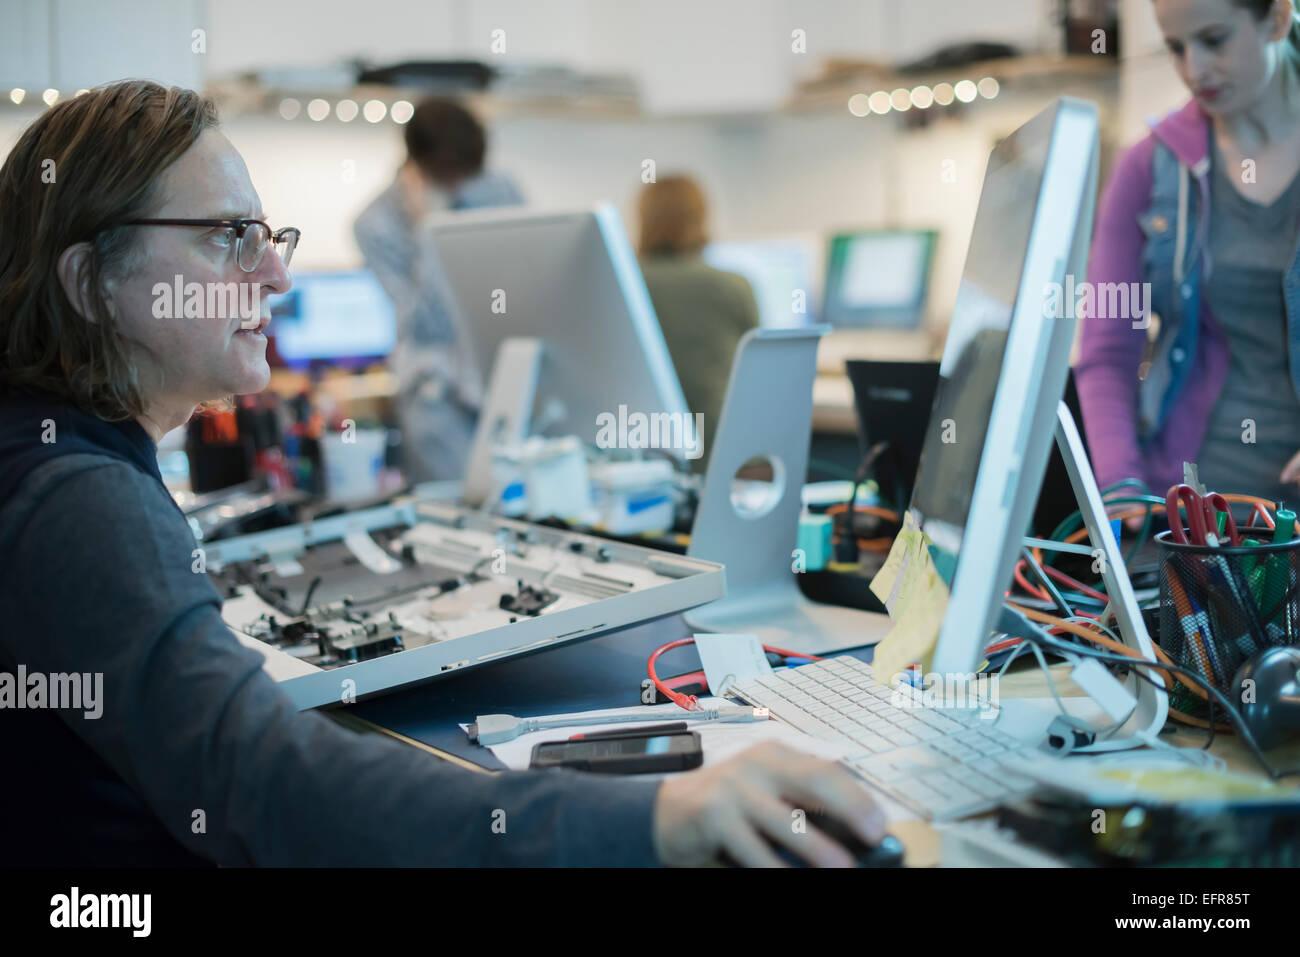 A man seated at a computer, looking at the screen. Computer repair shop. - Stock Image